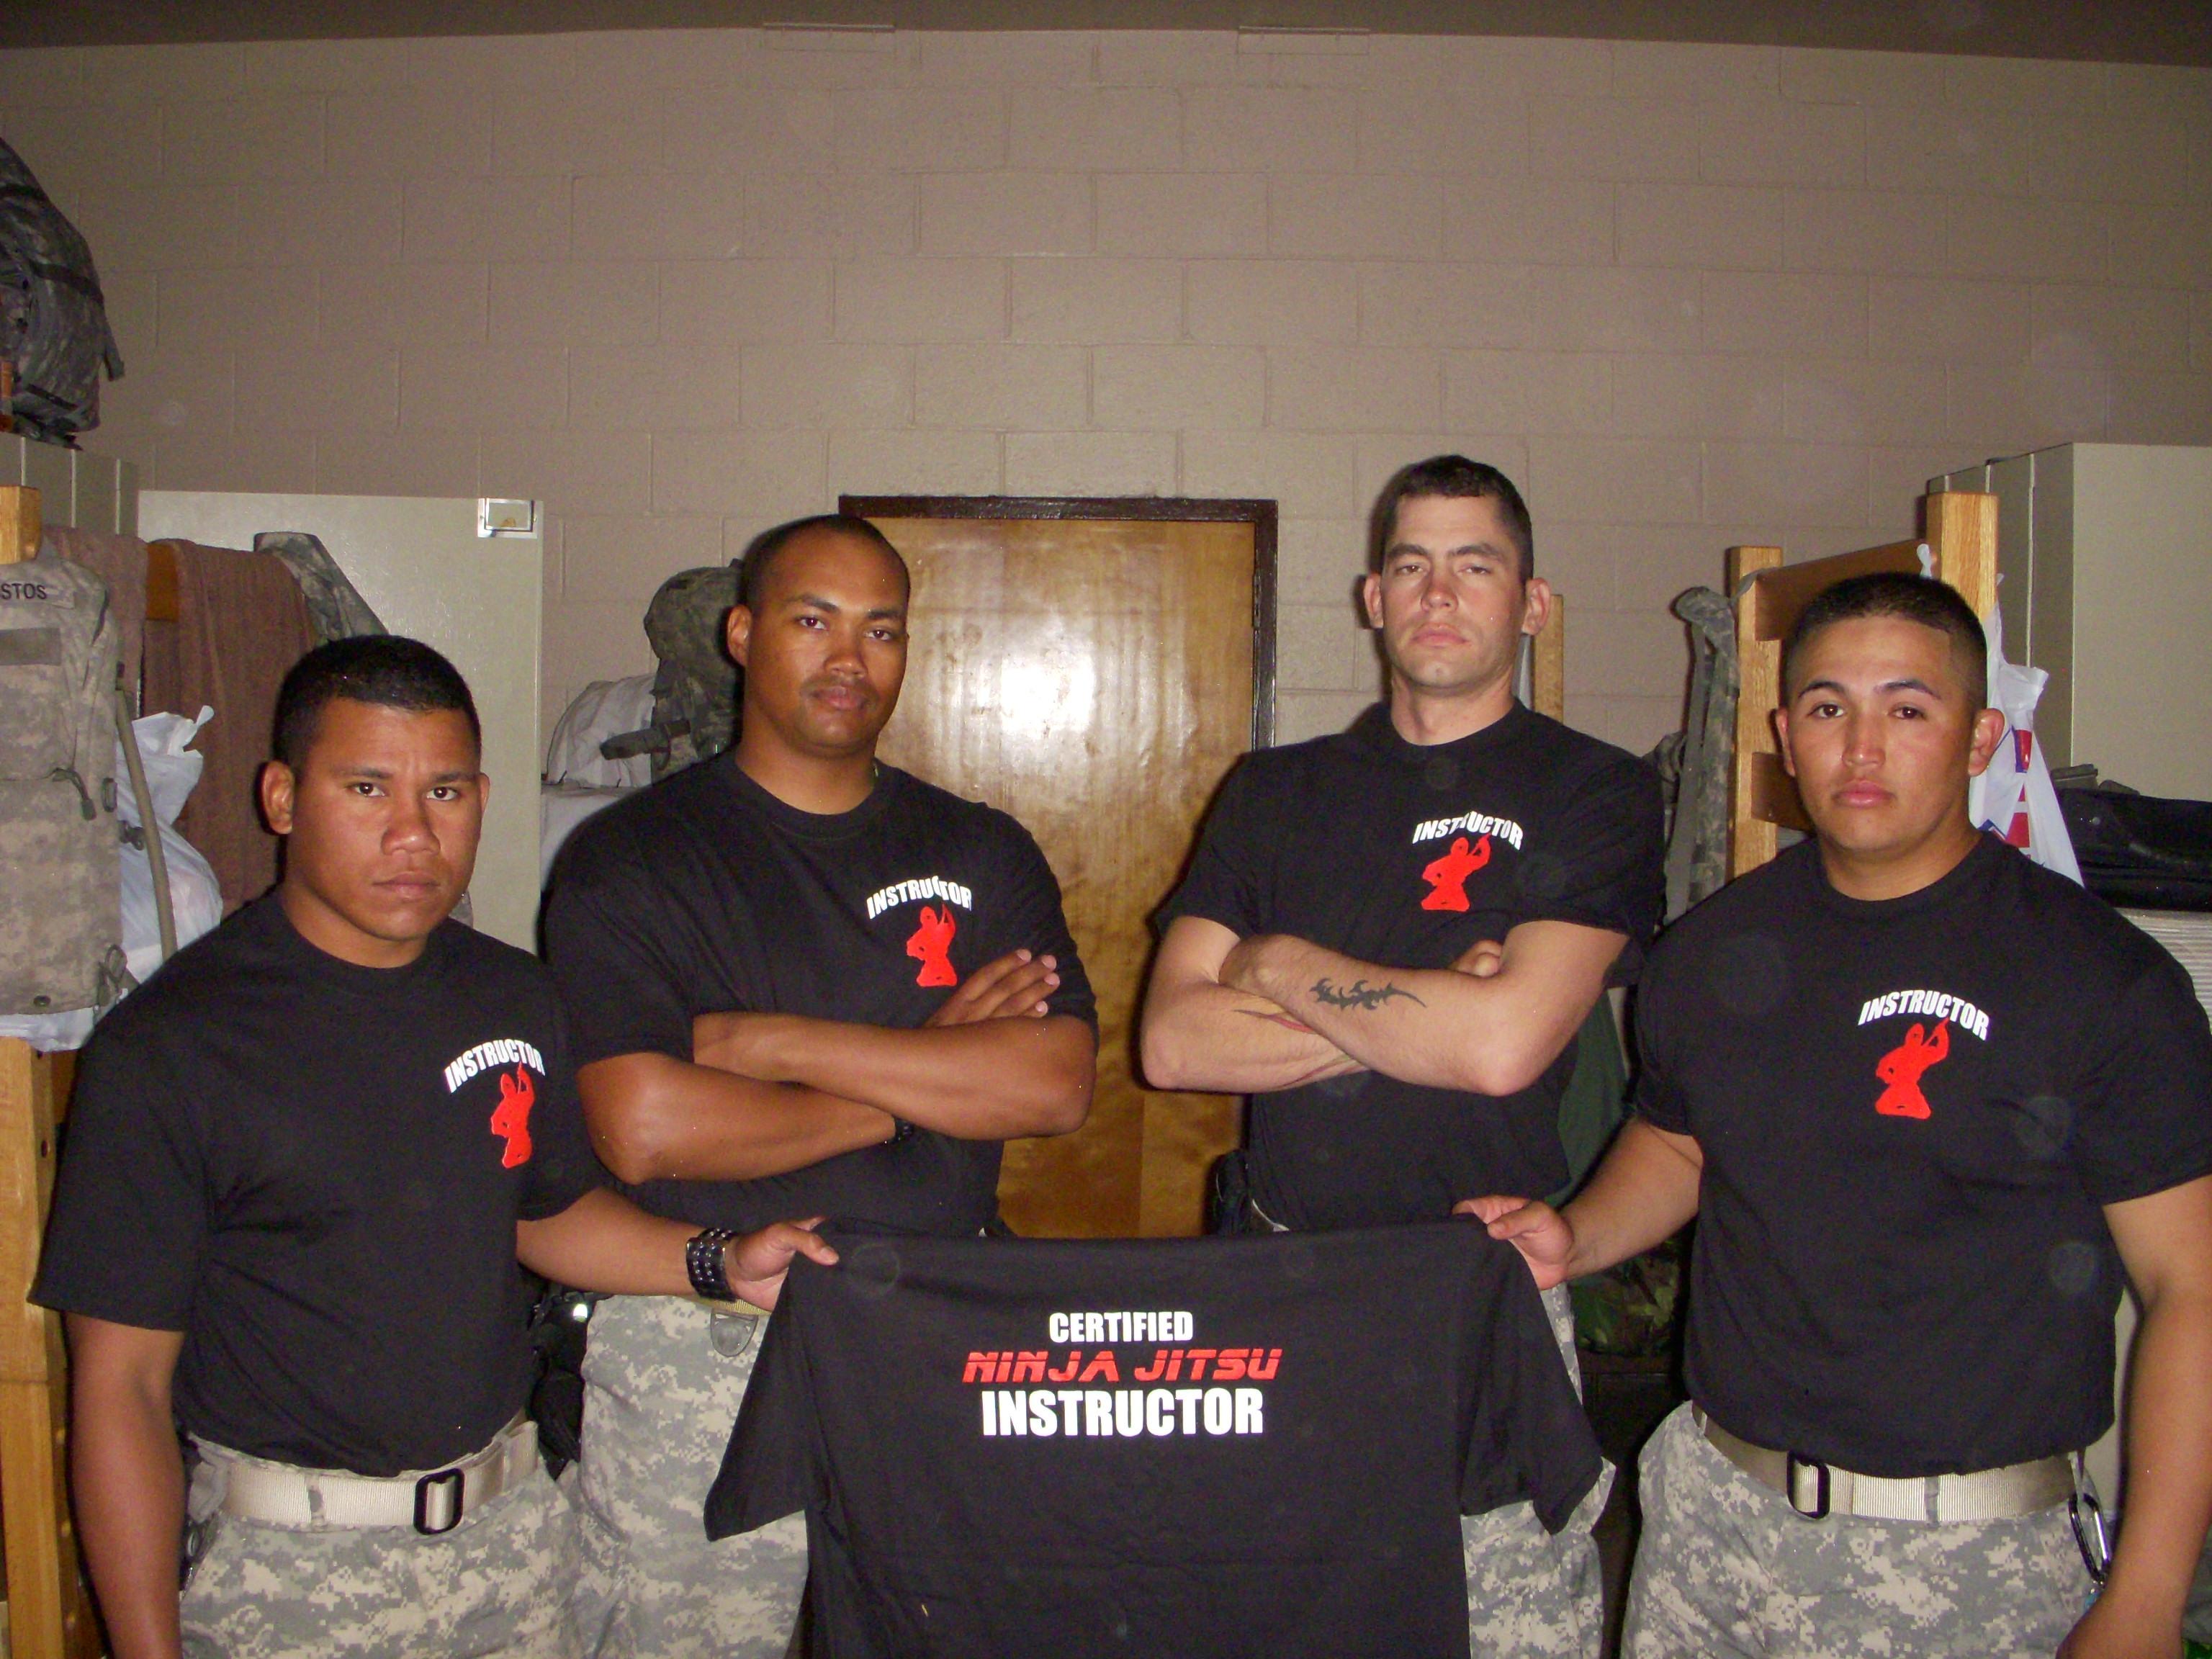 Custom T Shirts For Ninja In The Army Shirt Design Ideas